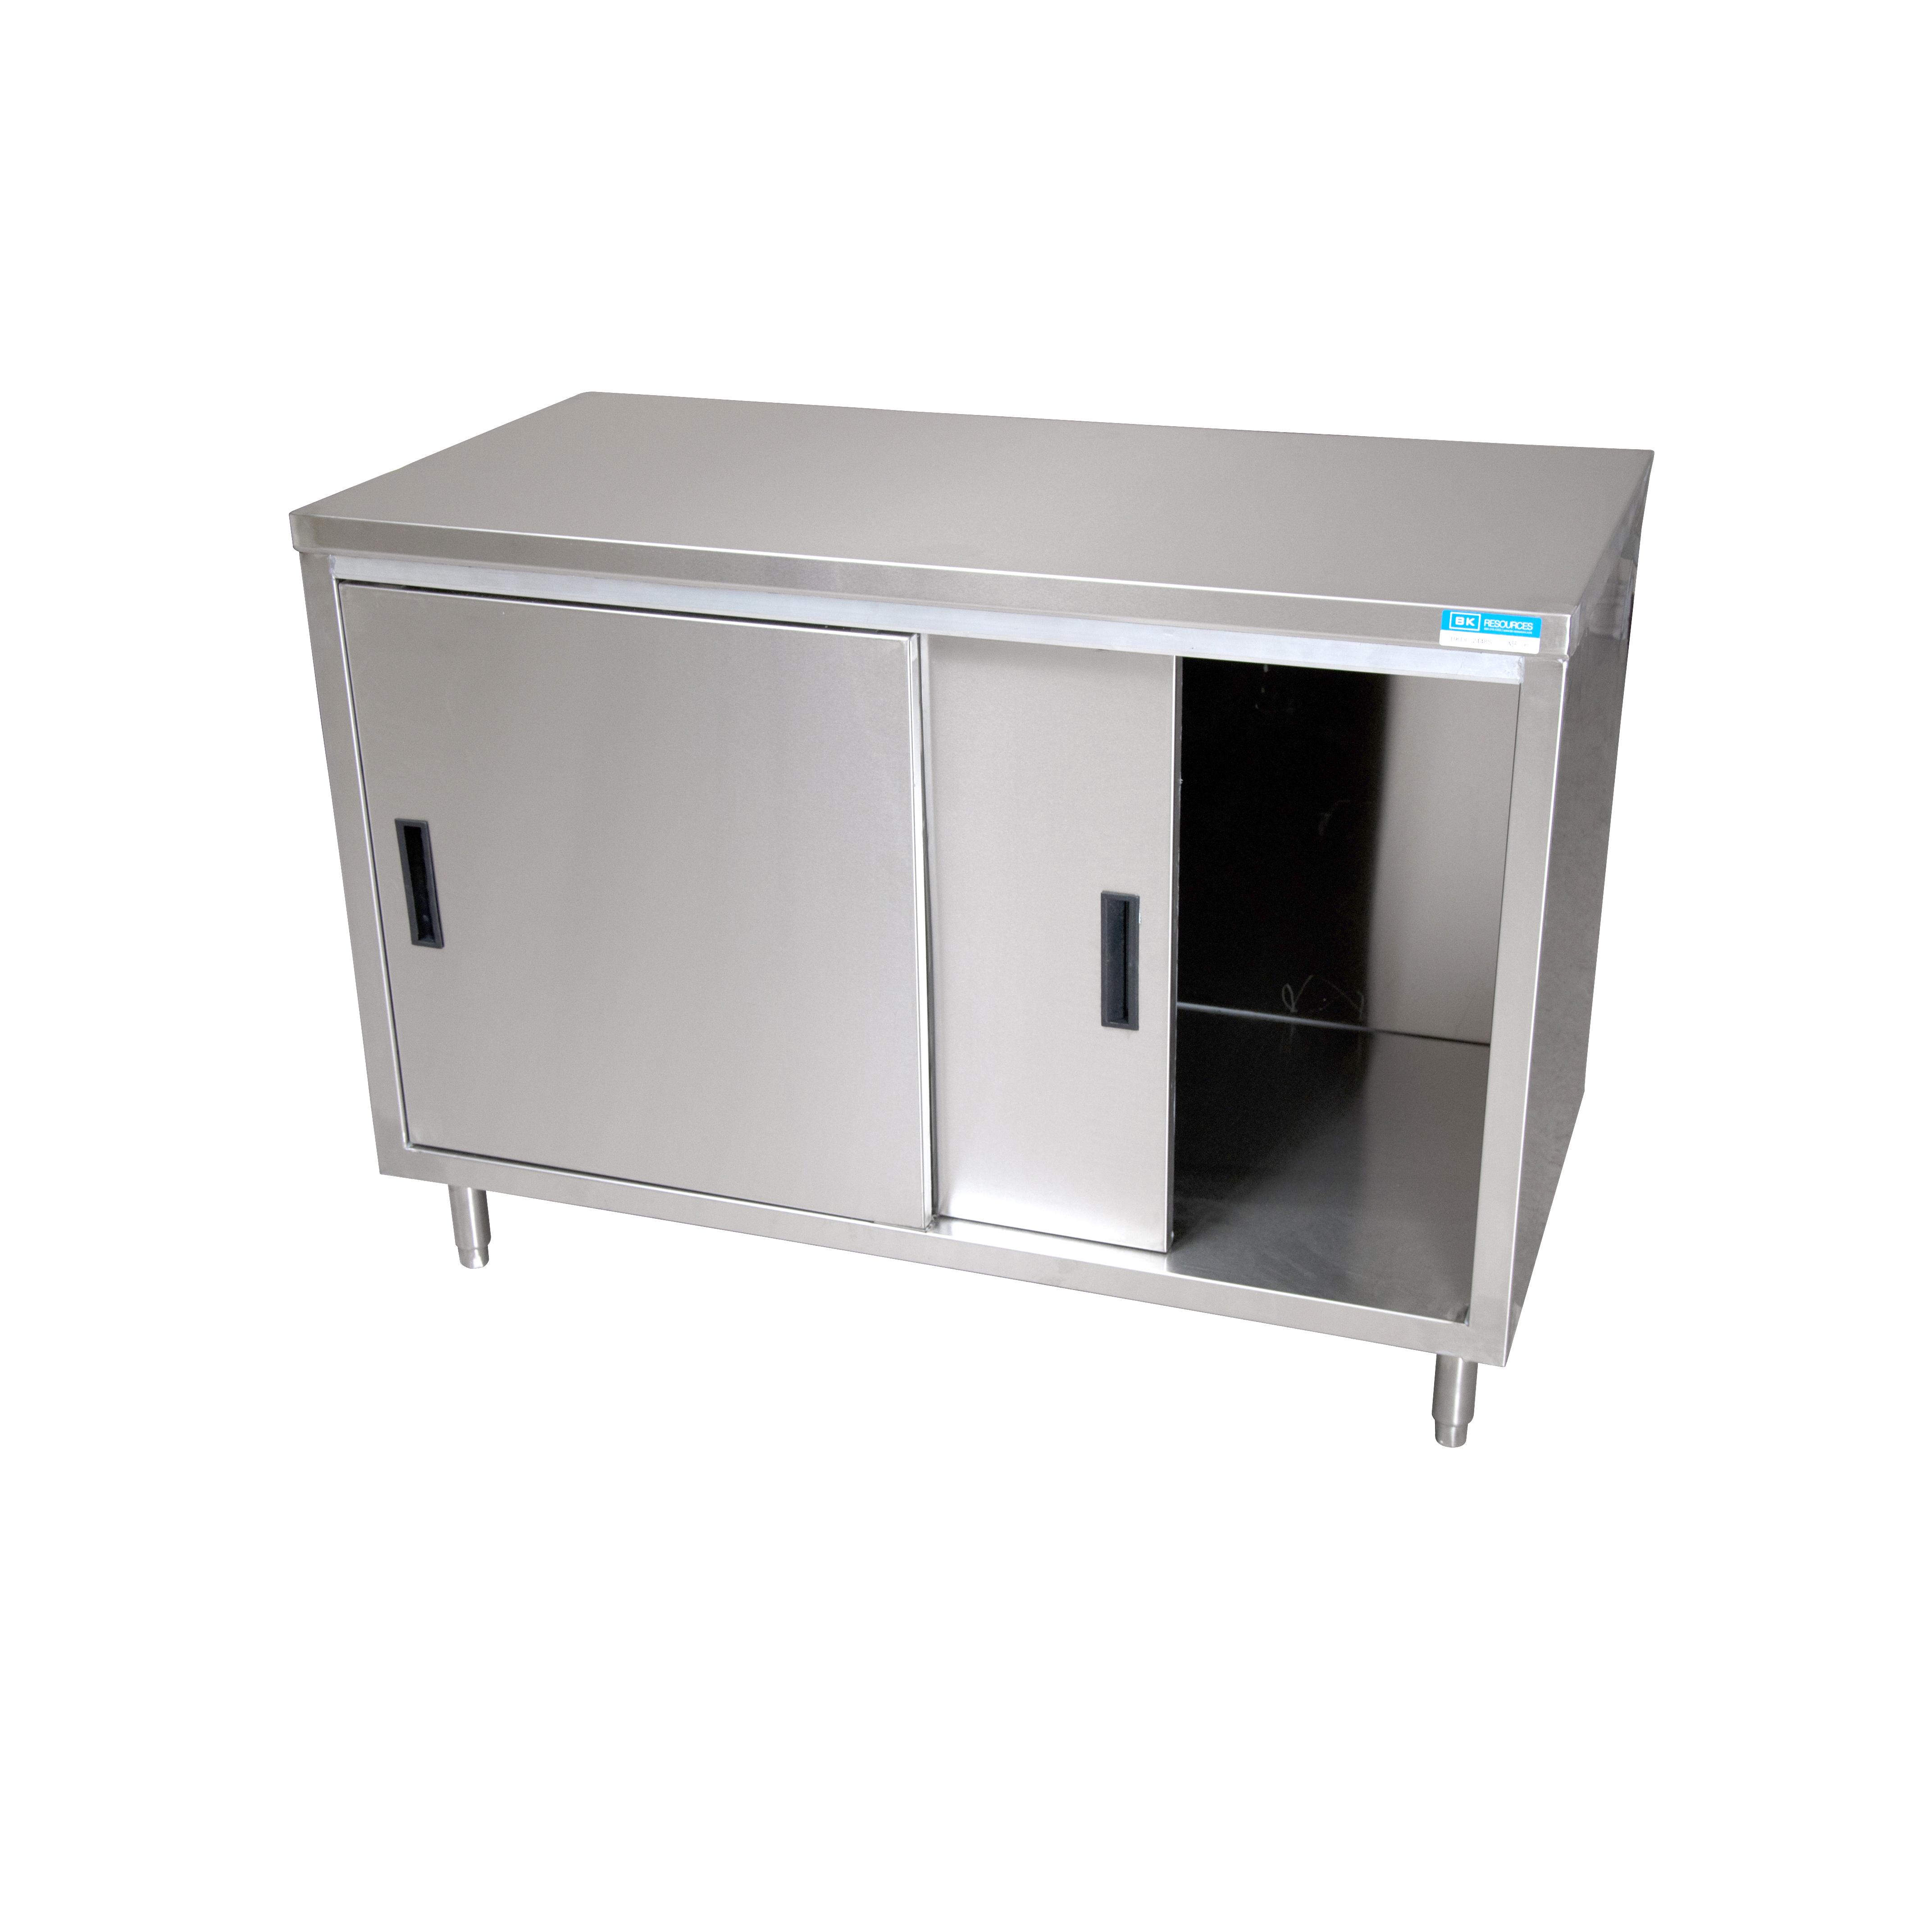 BK Resources BKDC-3696S work table, cabinet base sliding doors